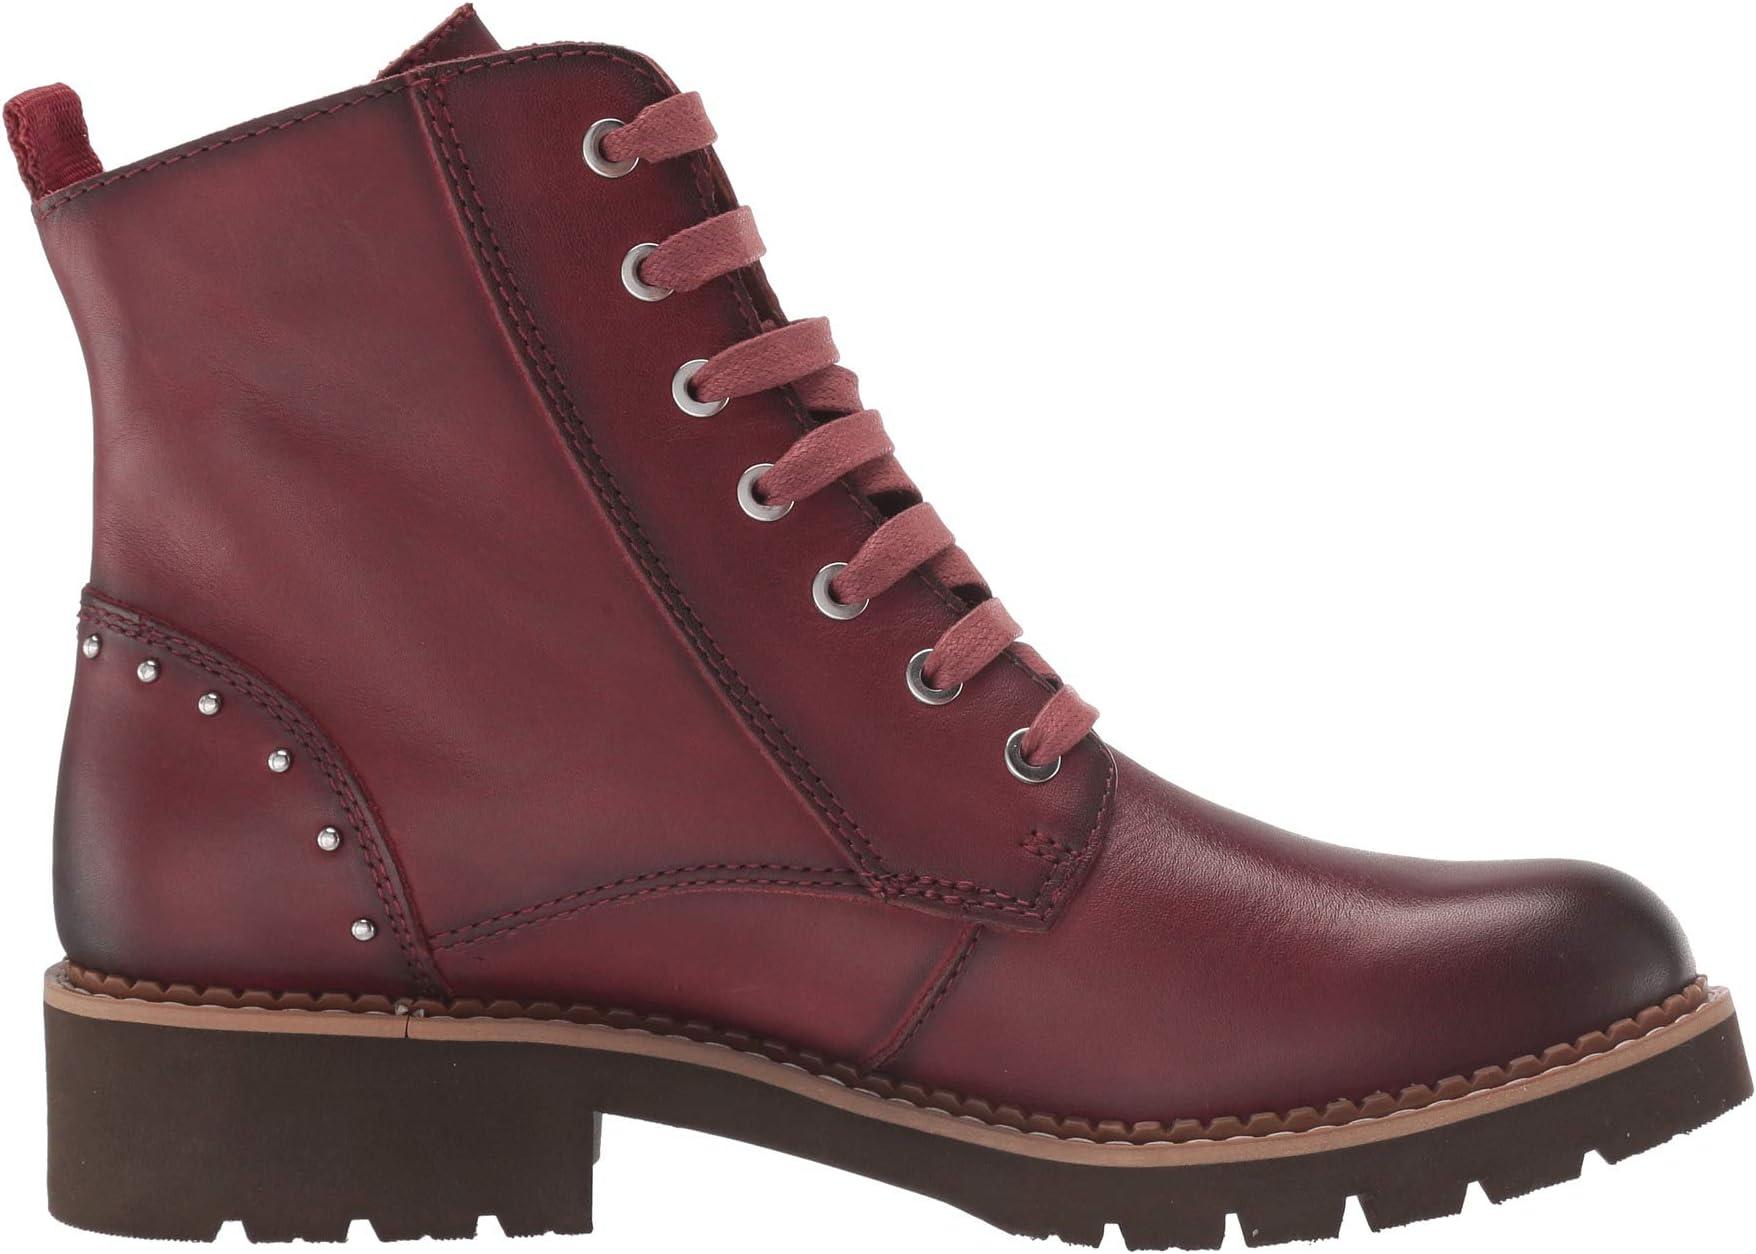 Pikolinos Vicar W0V-8610 | Women's shoes | 2020 Newest